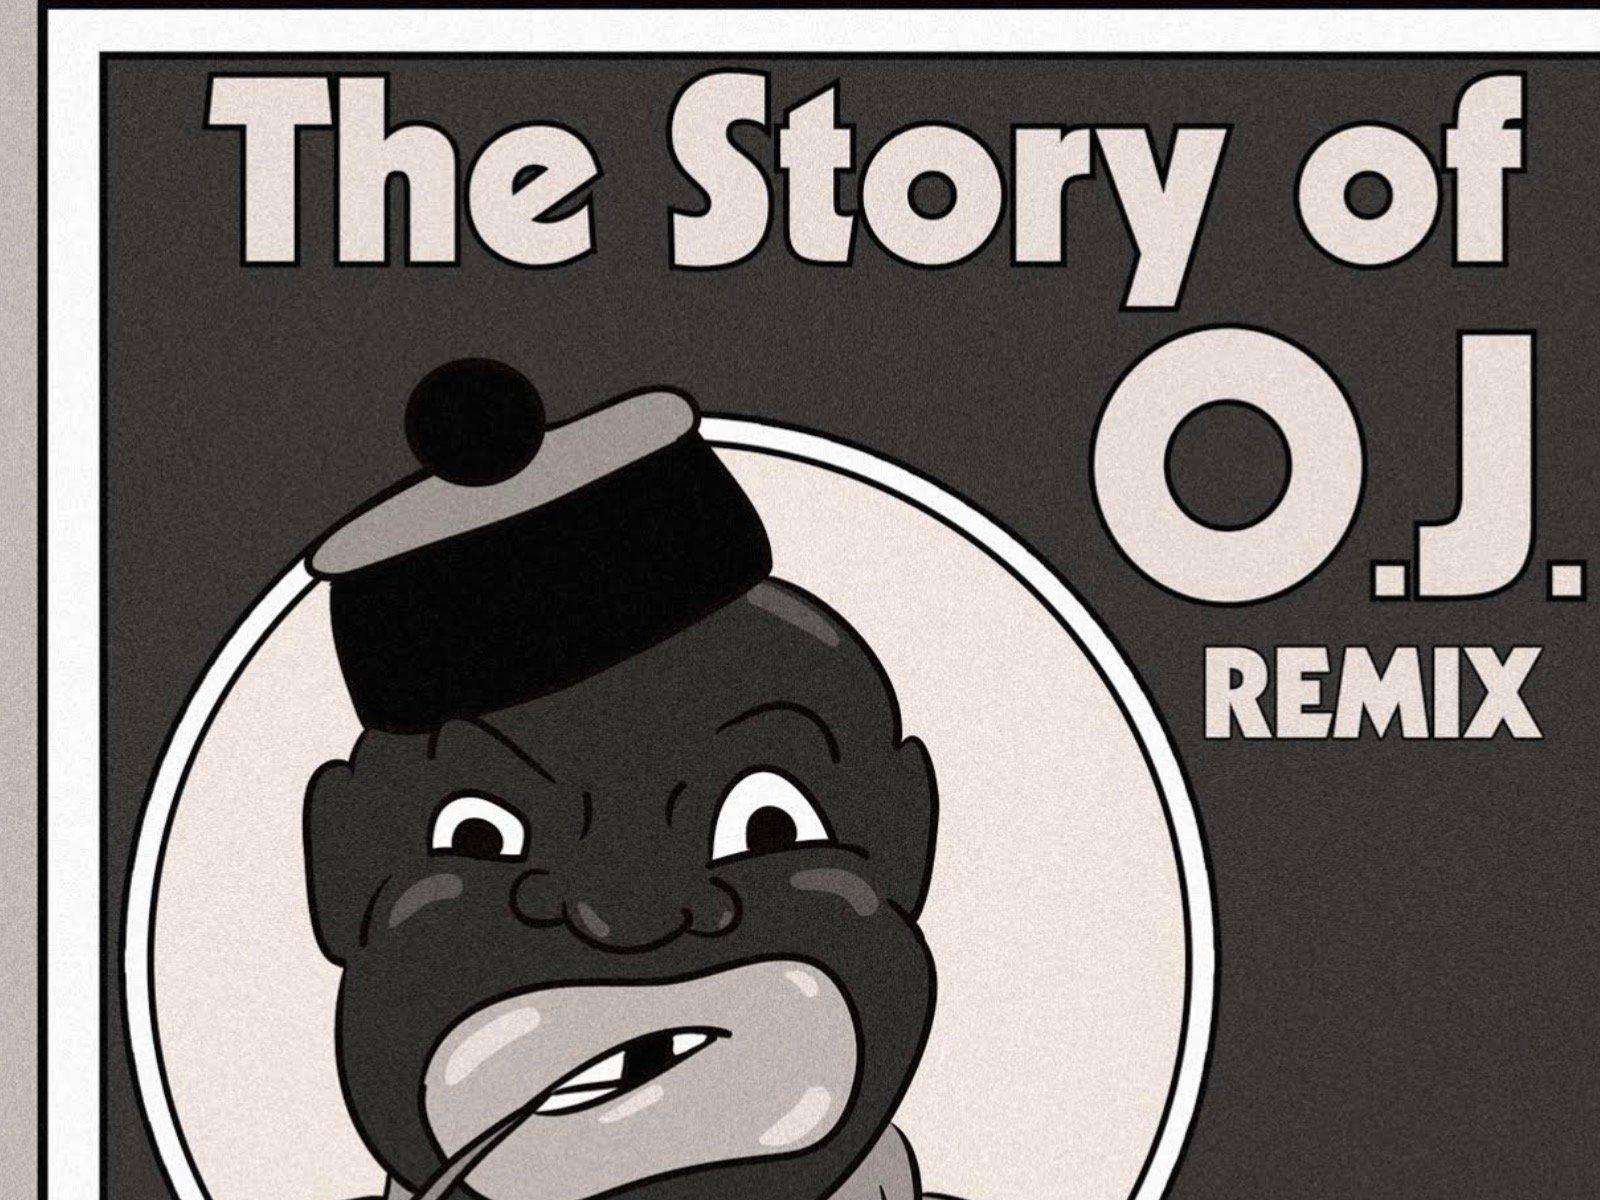 The Story Of OJ Remix